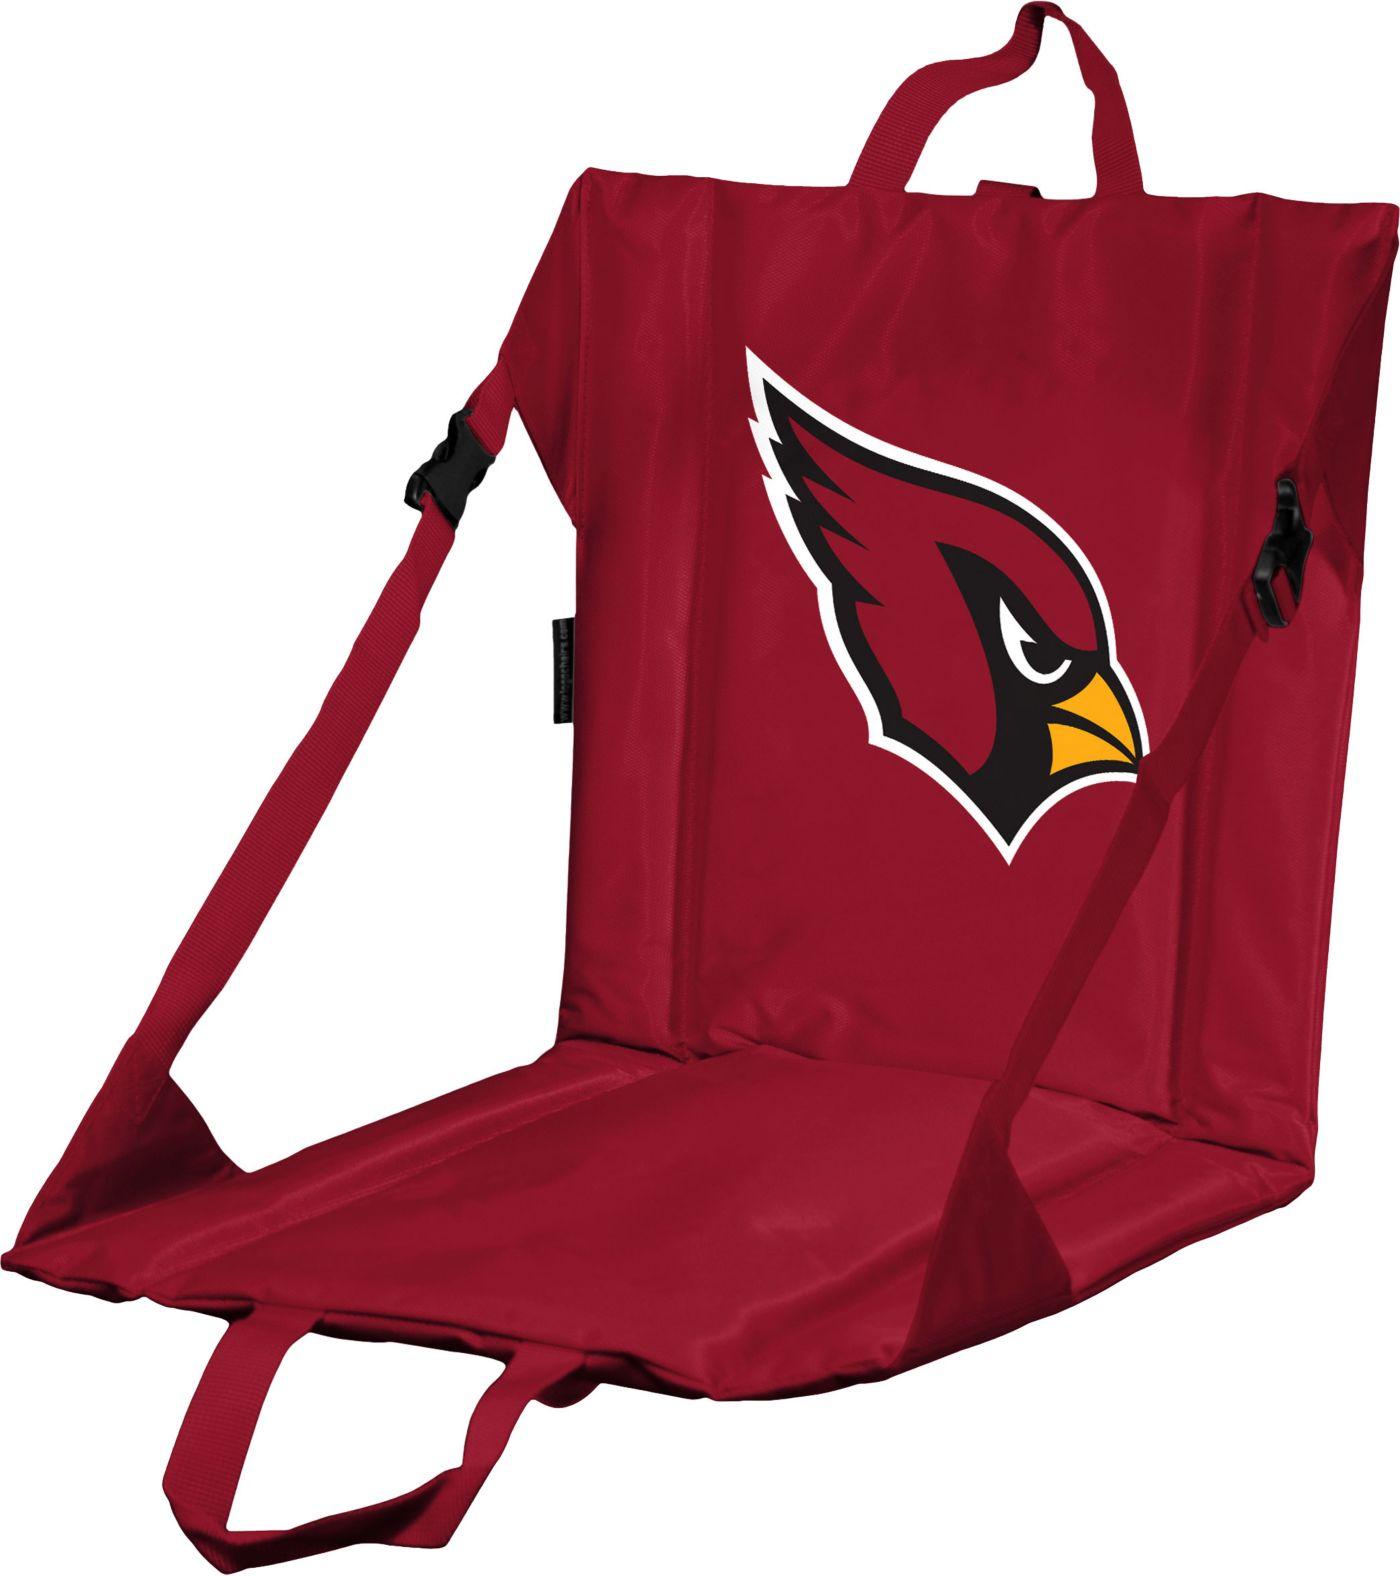 Arizona Cardinals Stadium Seat